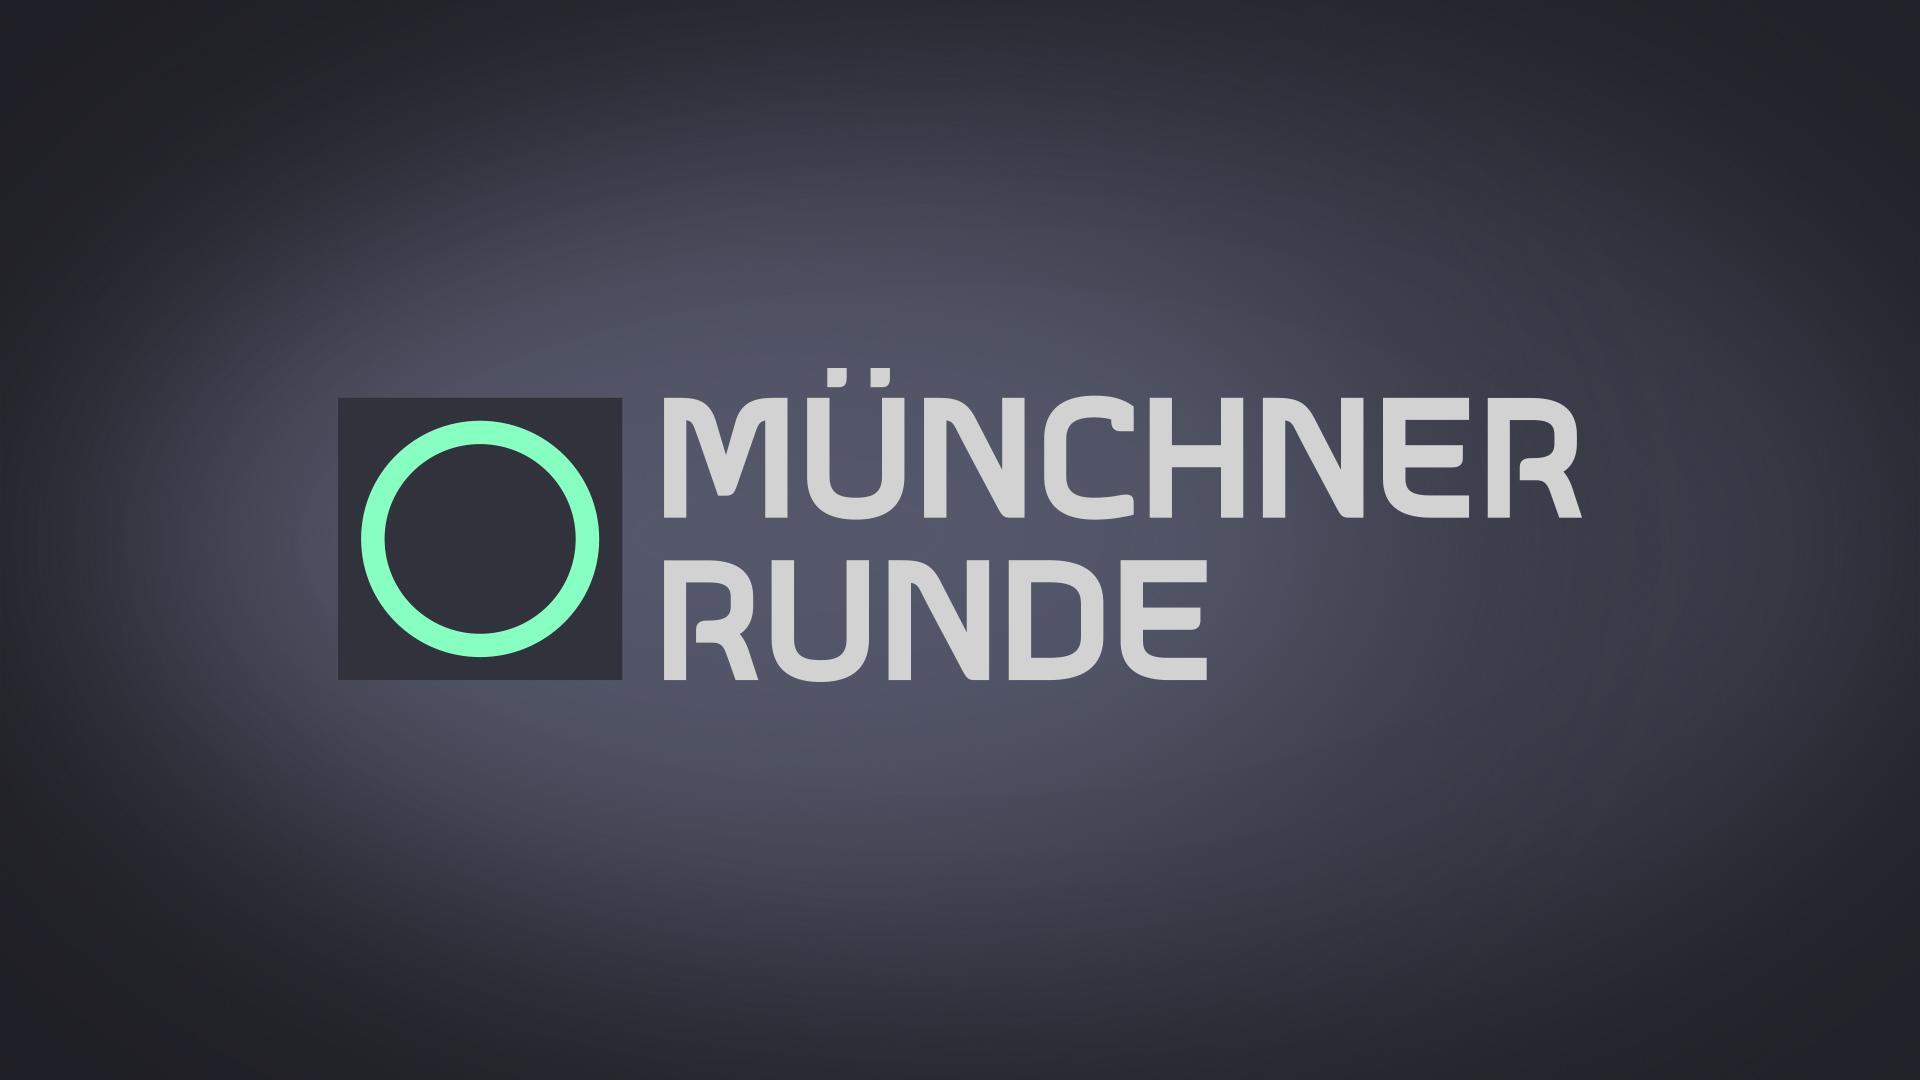 Münchner Runde - Sendereihenbild